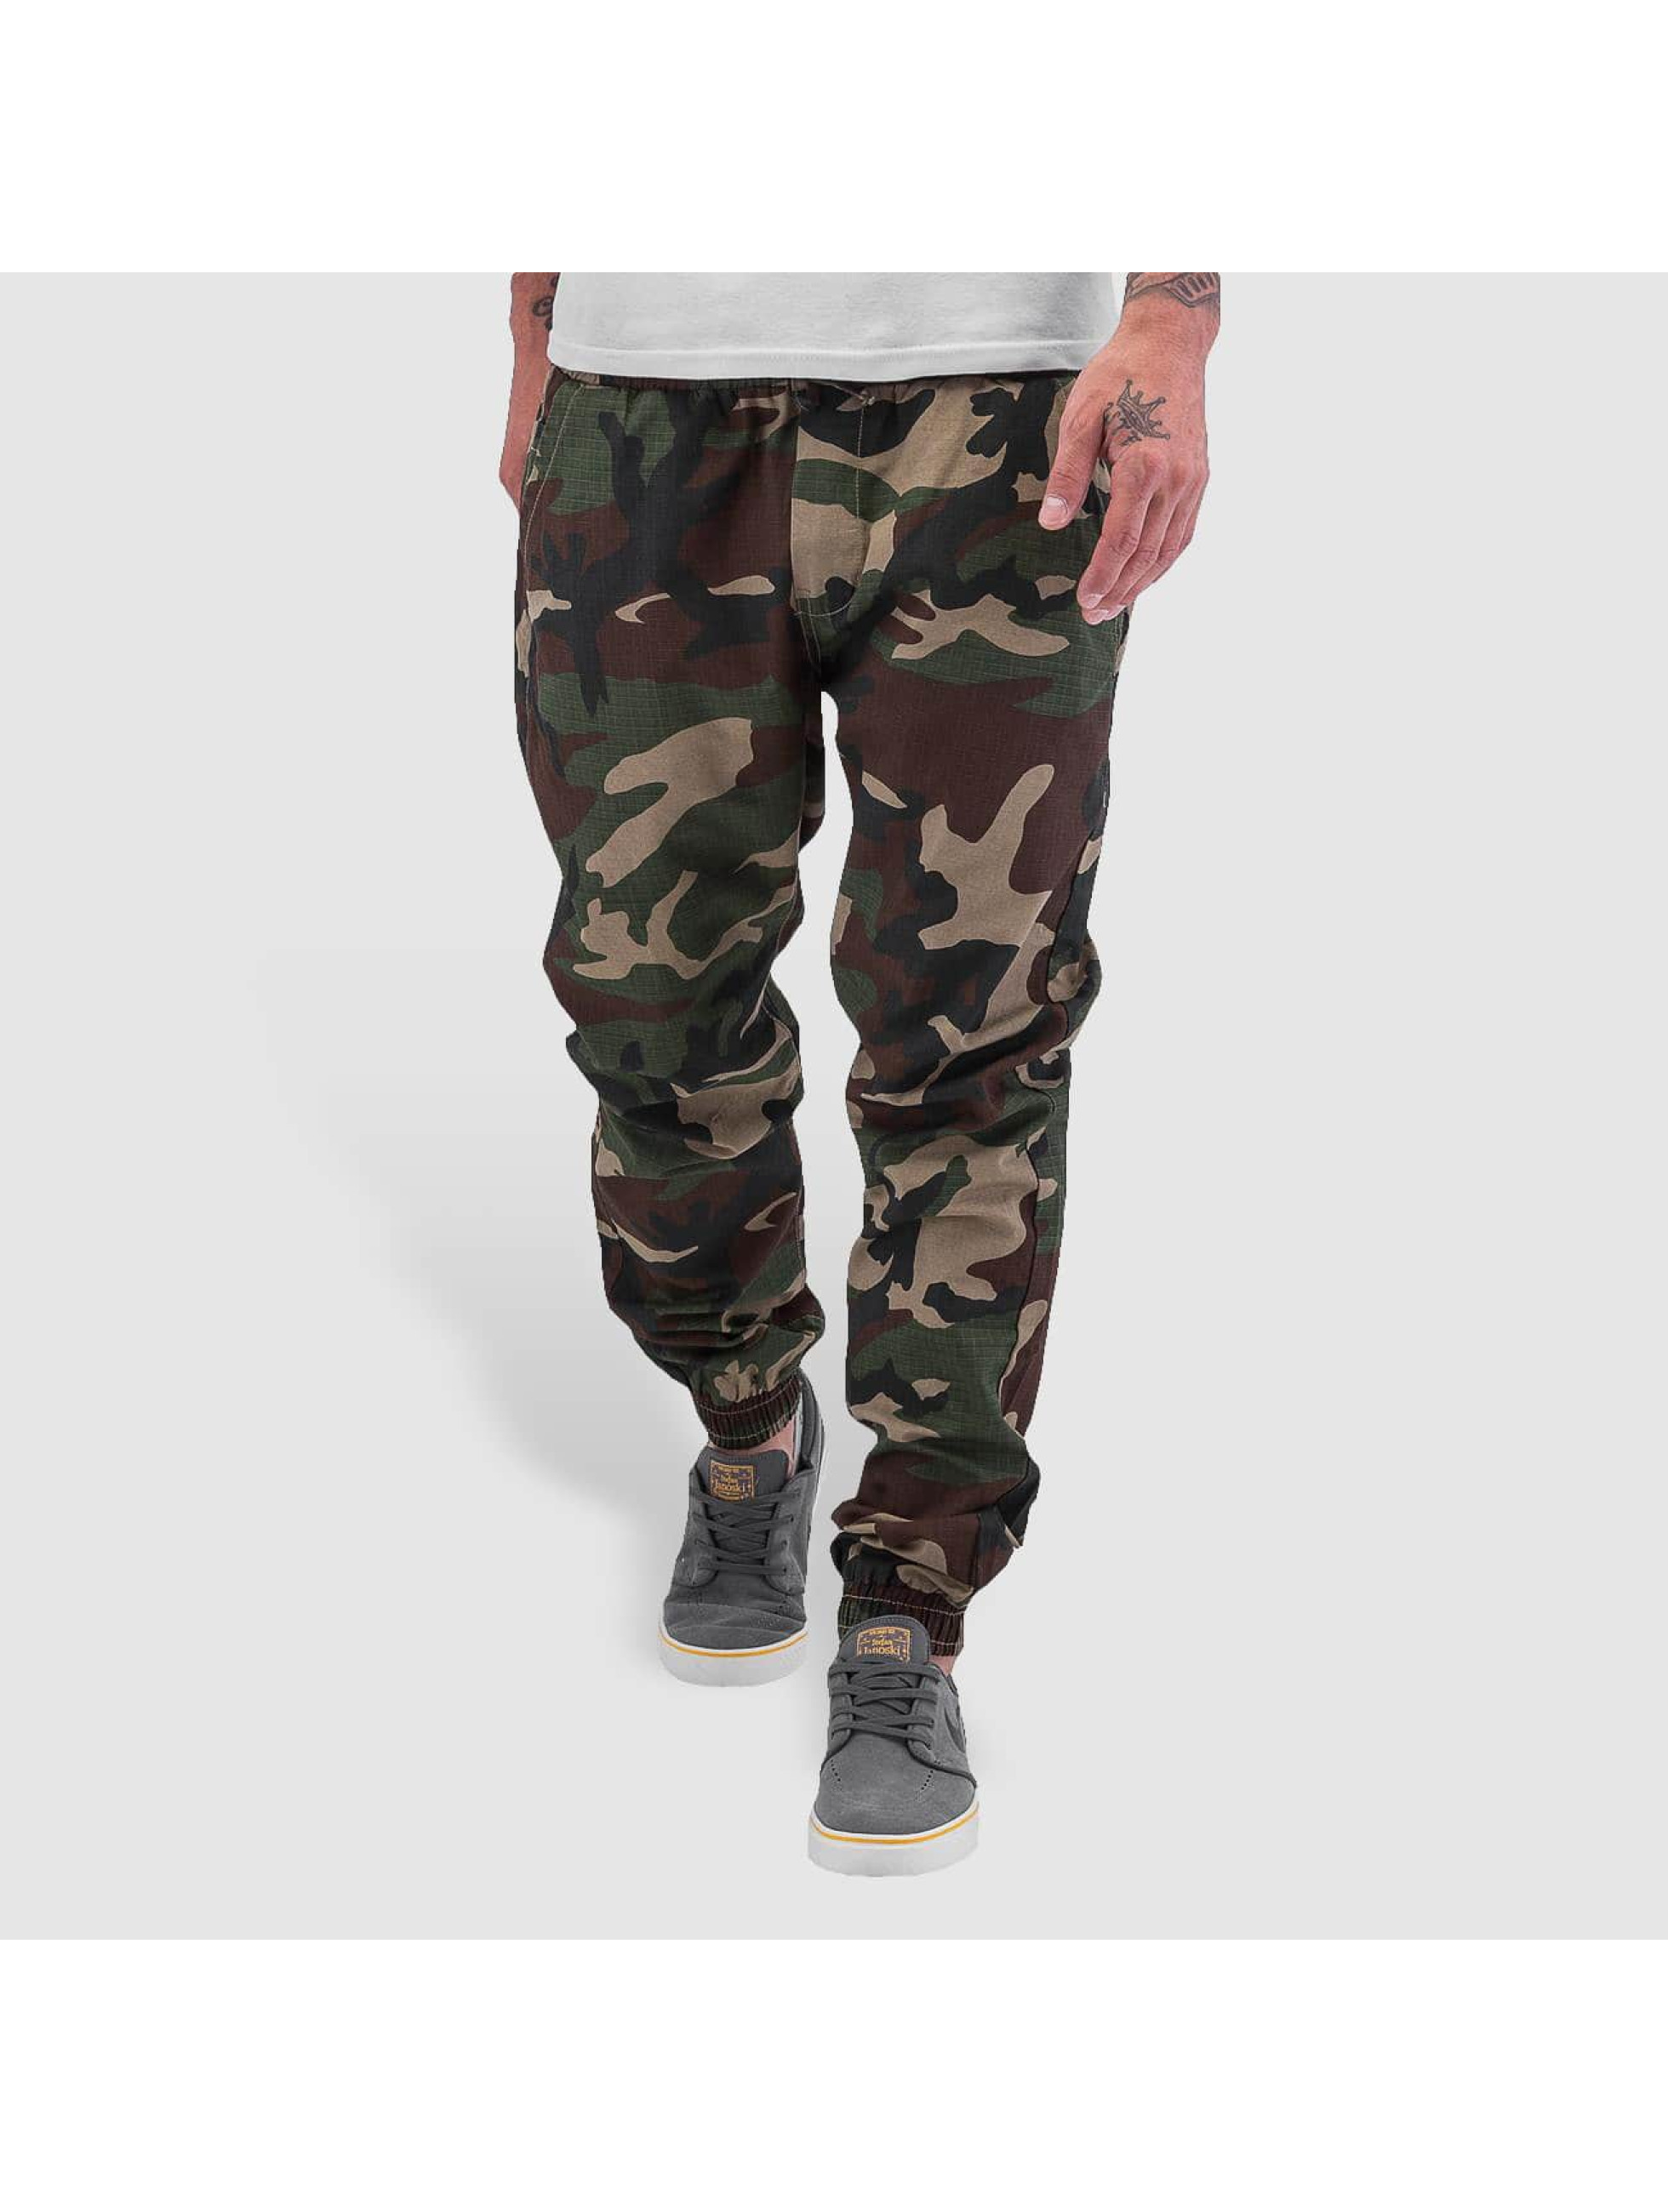 Jogginghose Camo Ripstop in camouflage